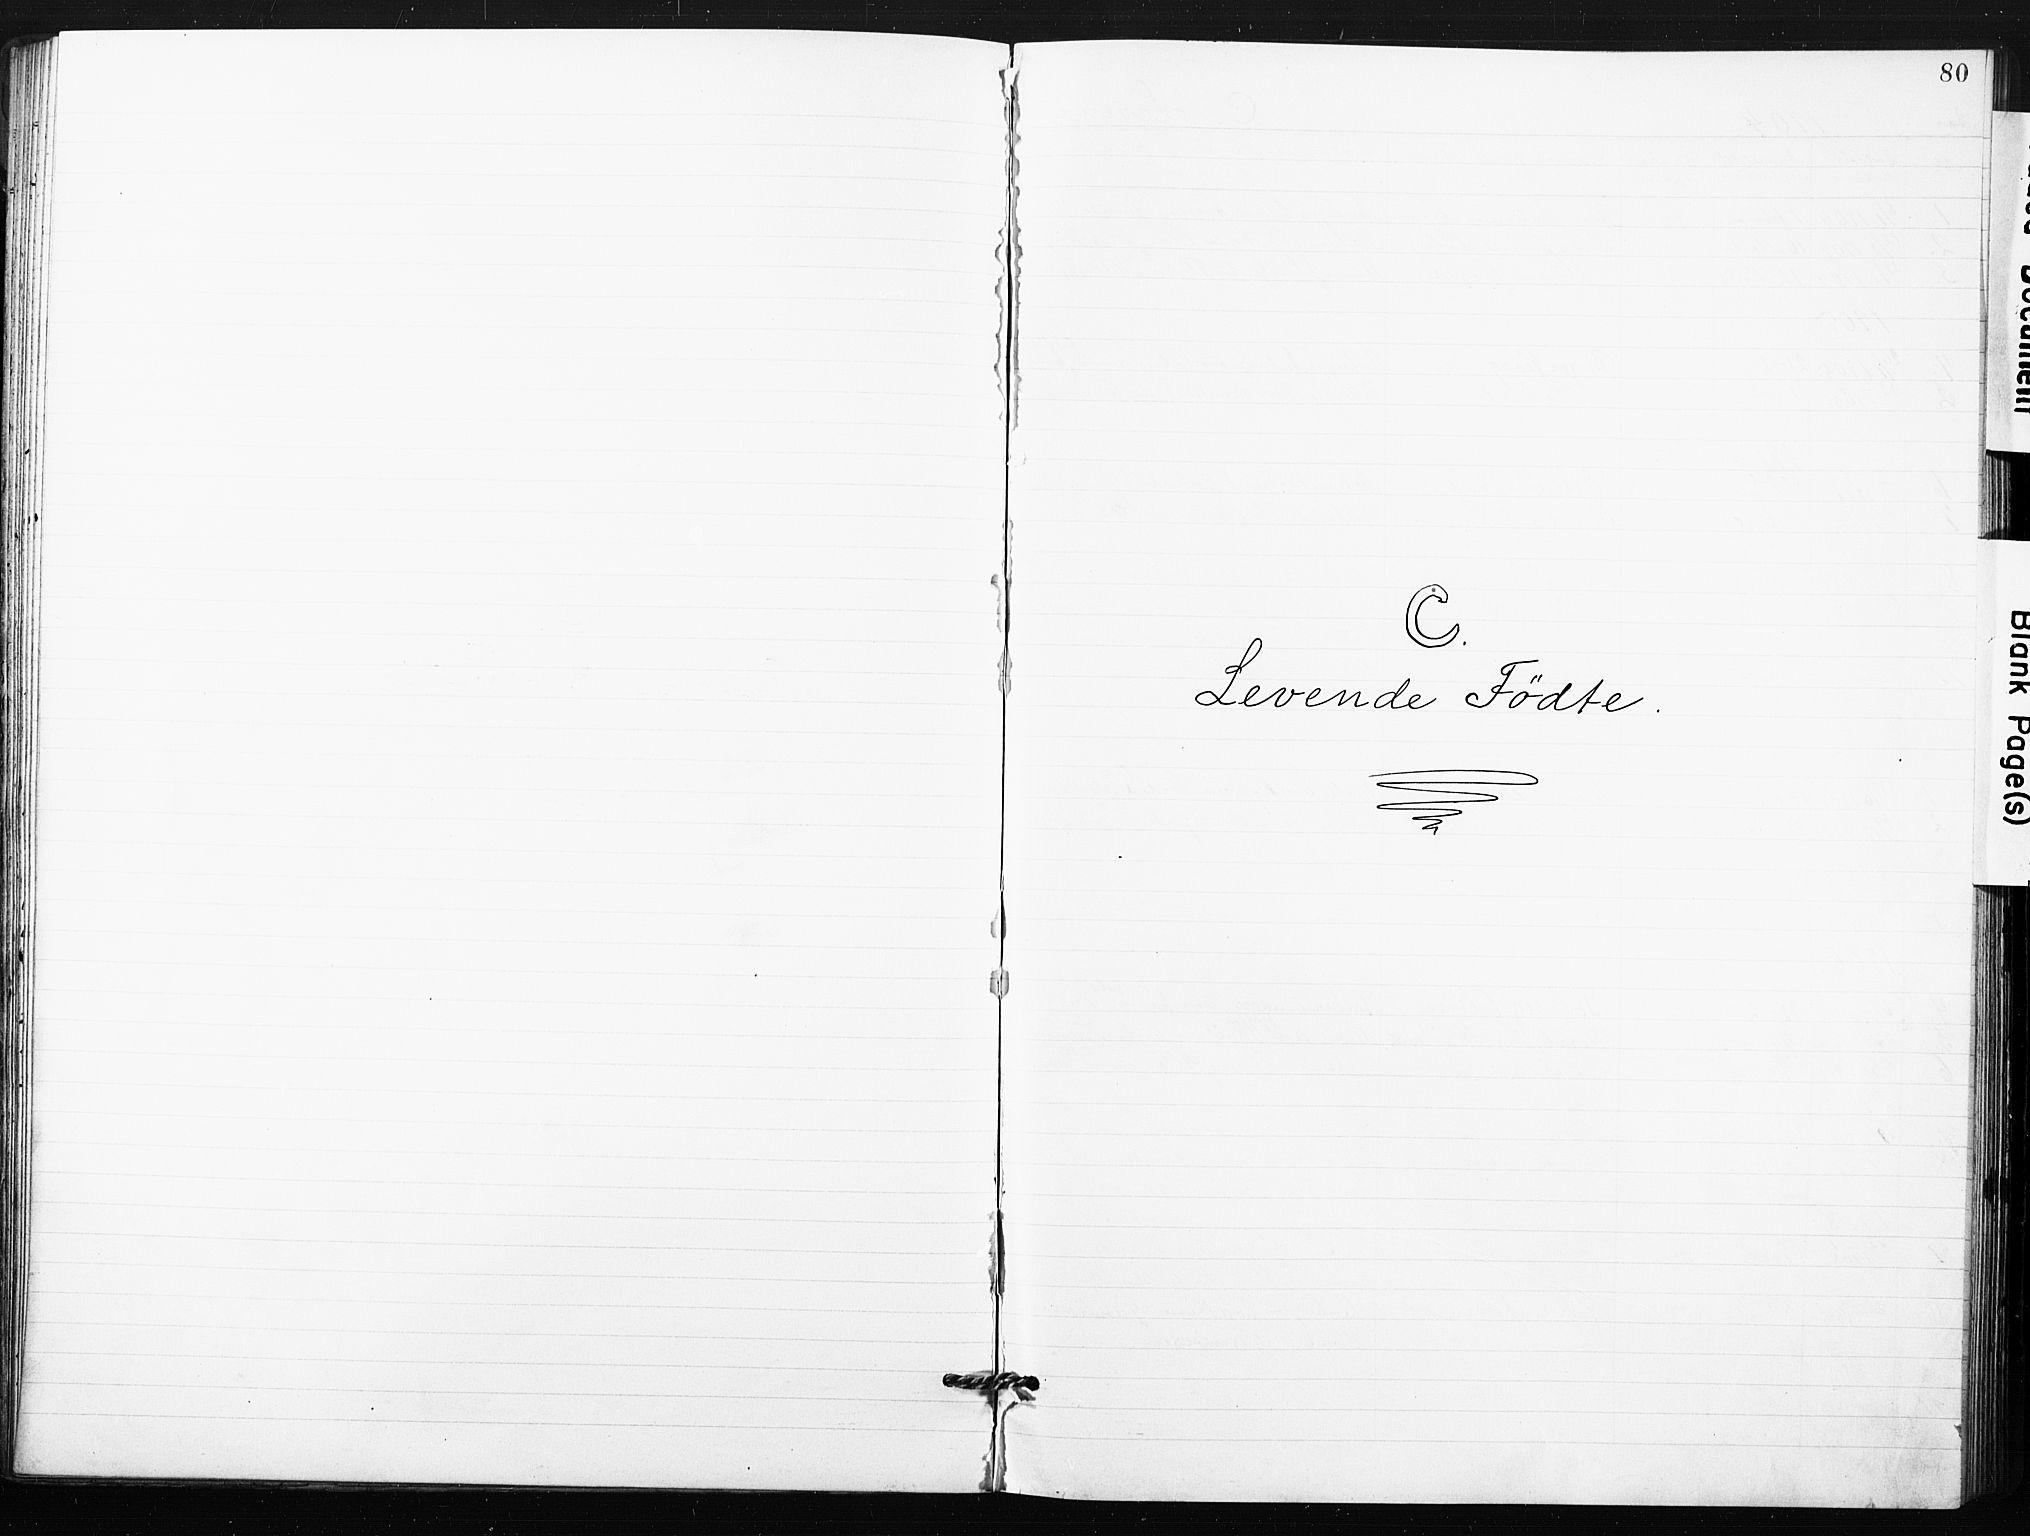 SAO, Kristi menighet Fredrikstad , A/L0002: Dissenterprotokoll nr. 2, 1904-1932, s. 80